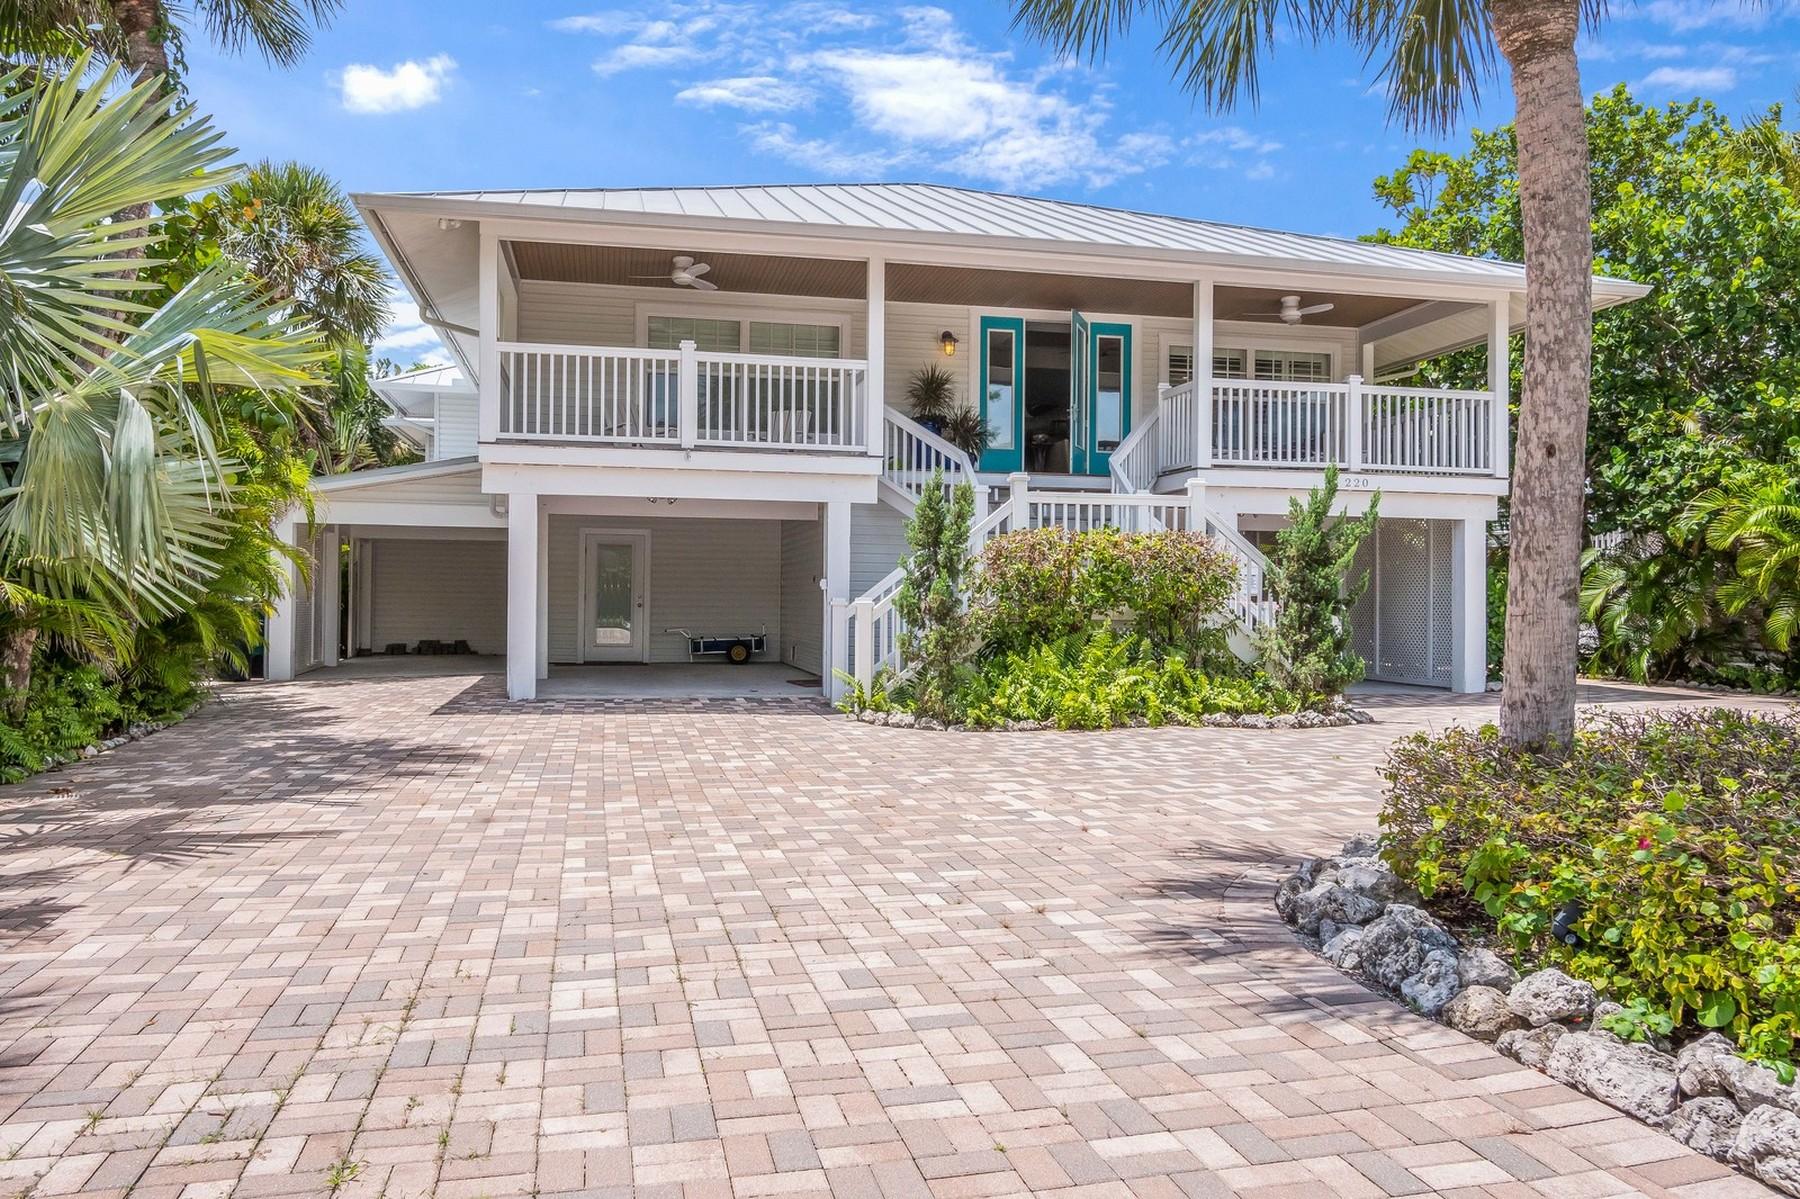 Single Family Home for Sale at 220 Seabreeze 220 Seabreeze Boca Grande, Florida 33921 United States